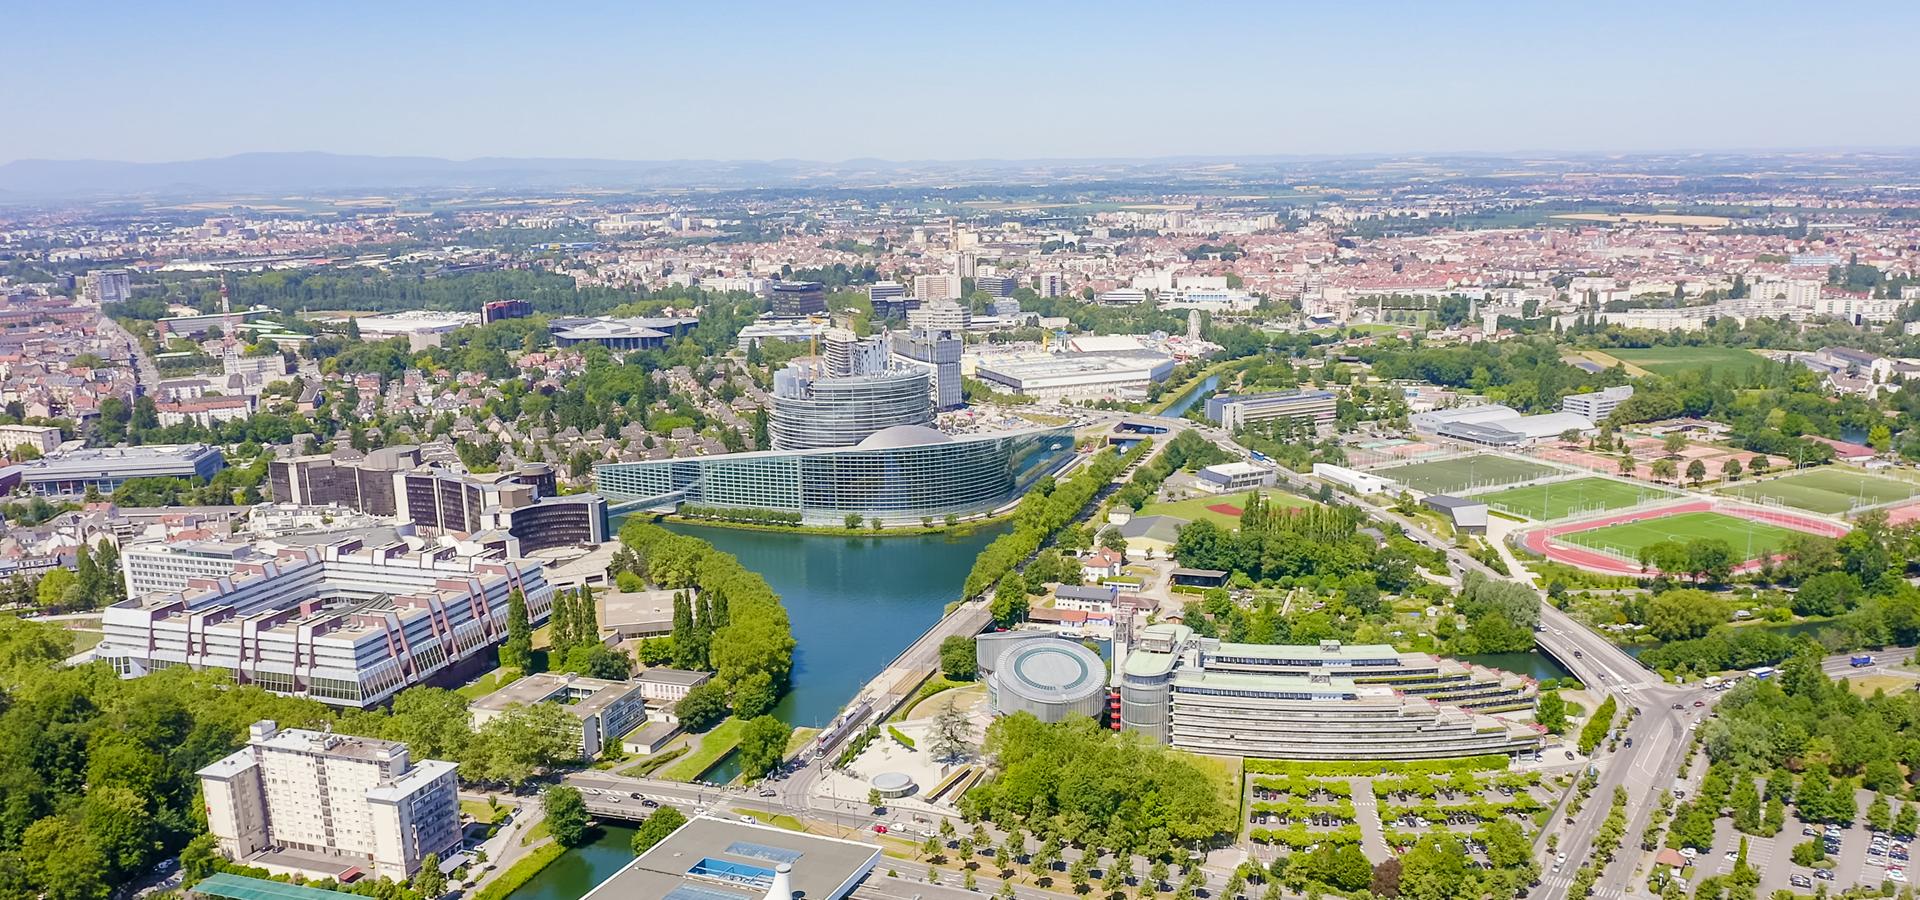 Peer-to-peer advisory in Strasbourg, Bas-Rhin Département, Grand Est, France